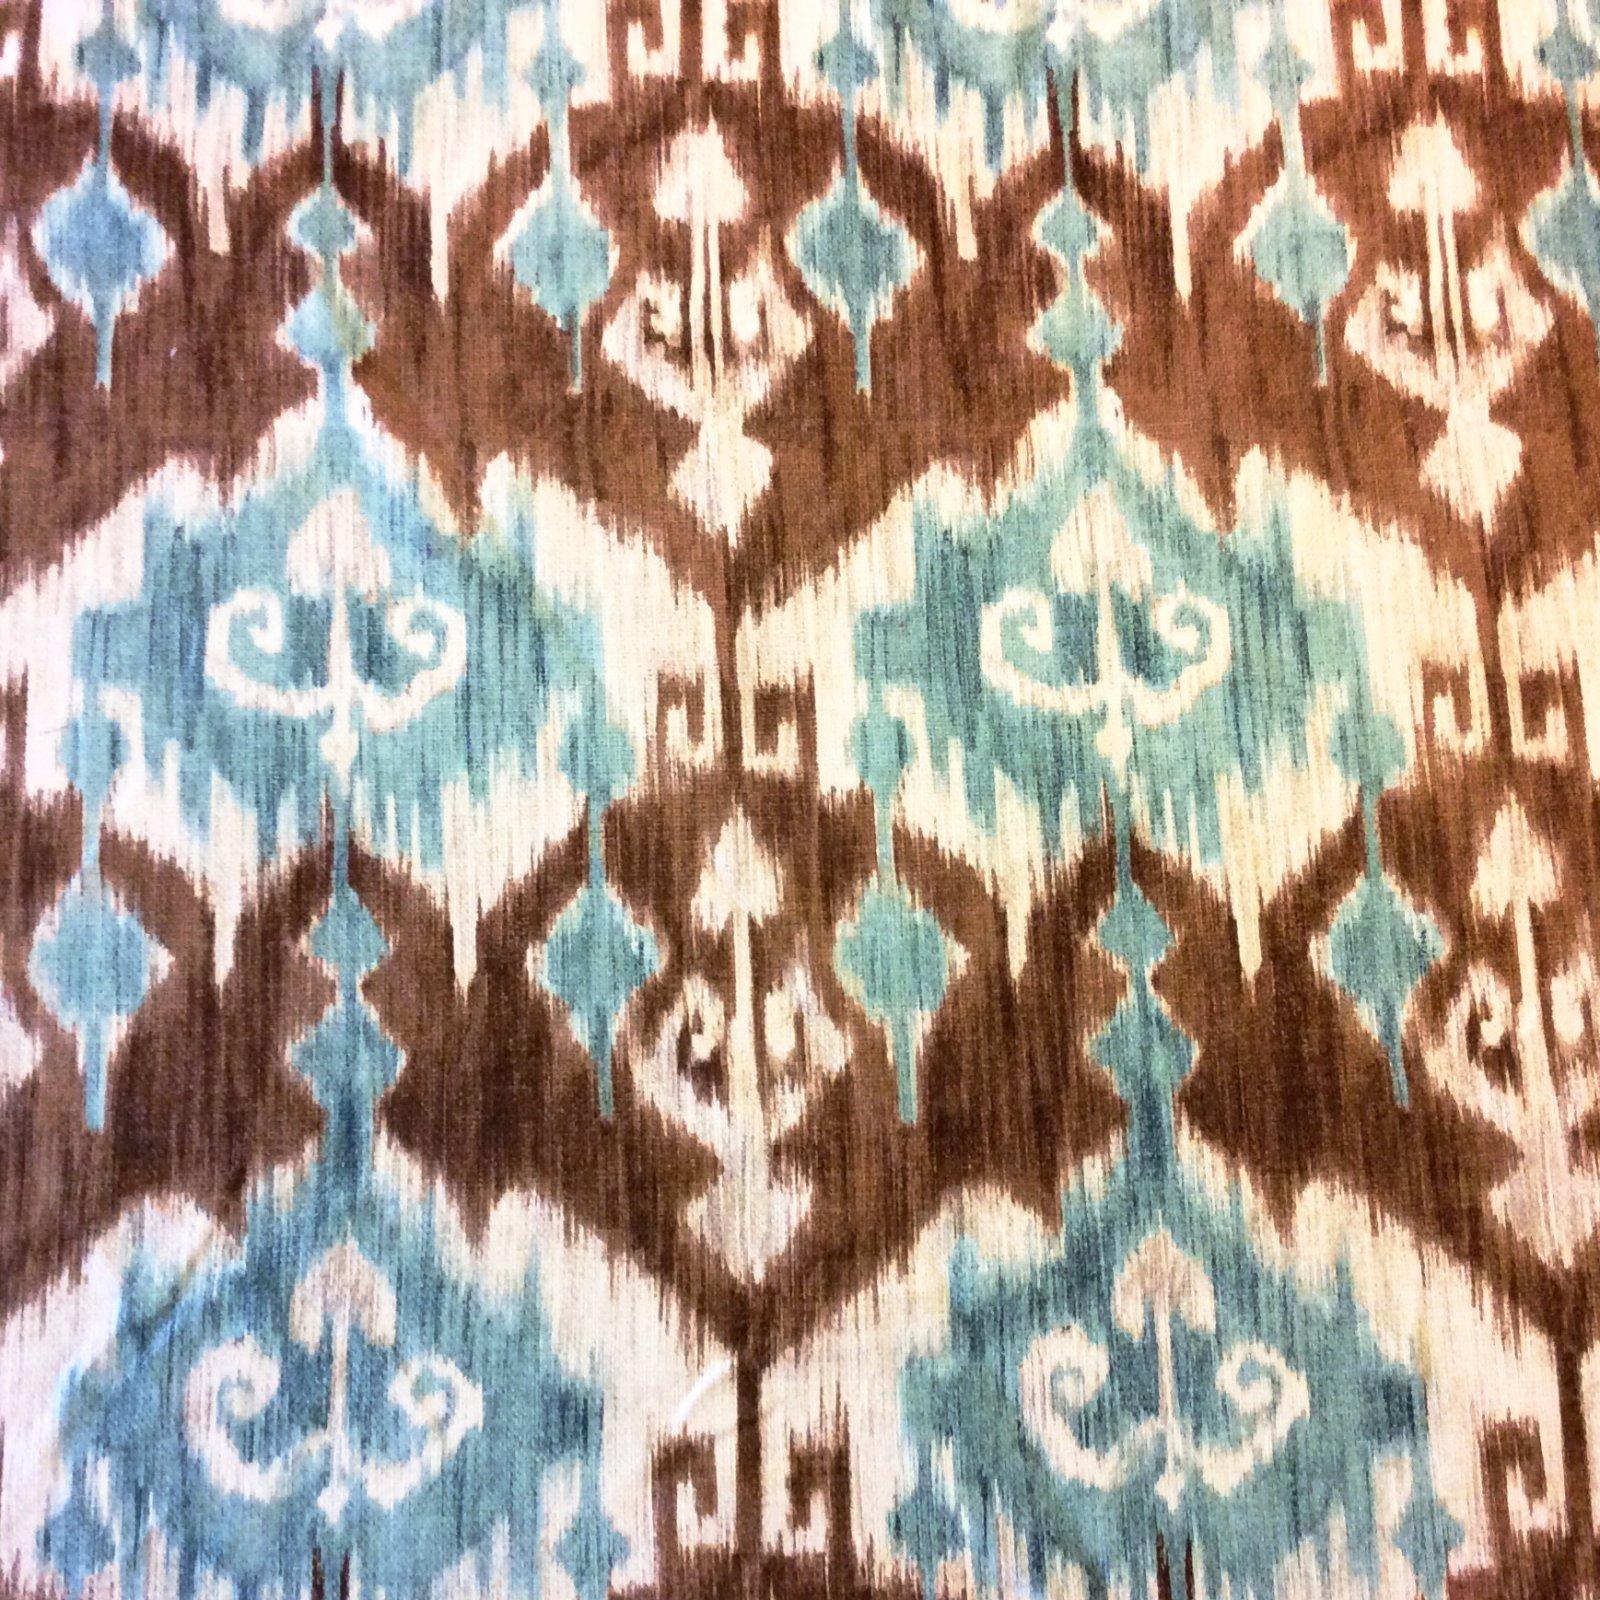 NL227 Brown & Blue Woven Ikat Geometric Geo Heavy Upholstery Home Decor Fabric